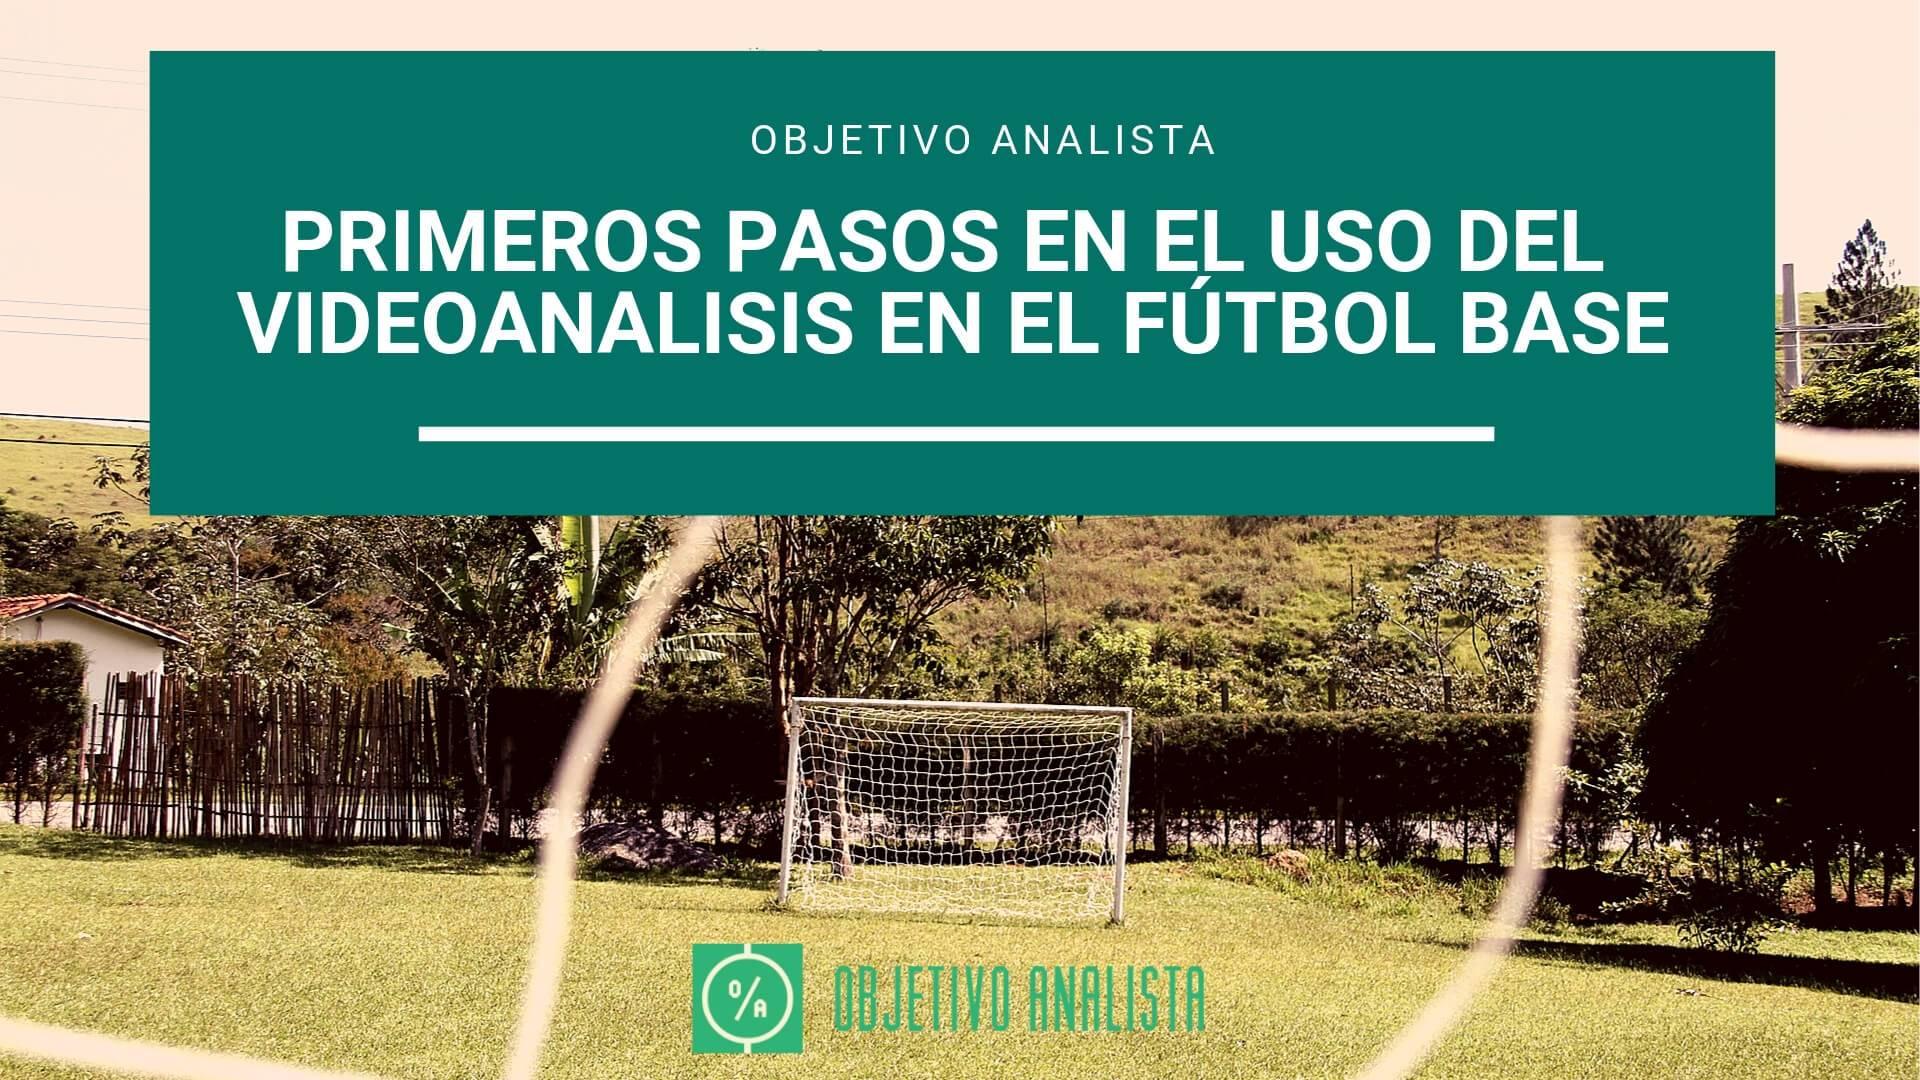 Primeros pasos videoanalisis fútbol base